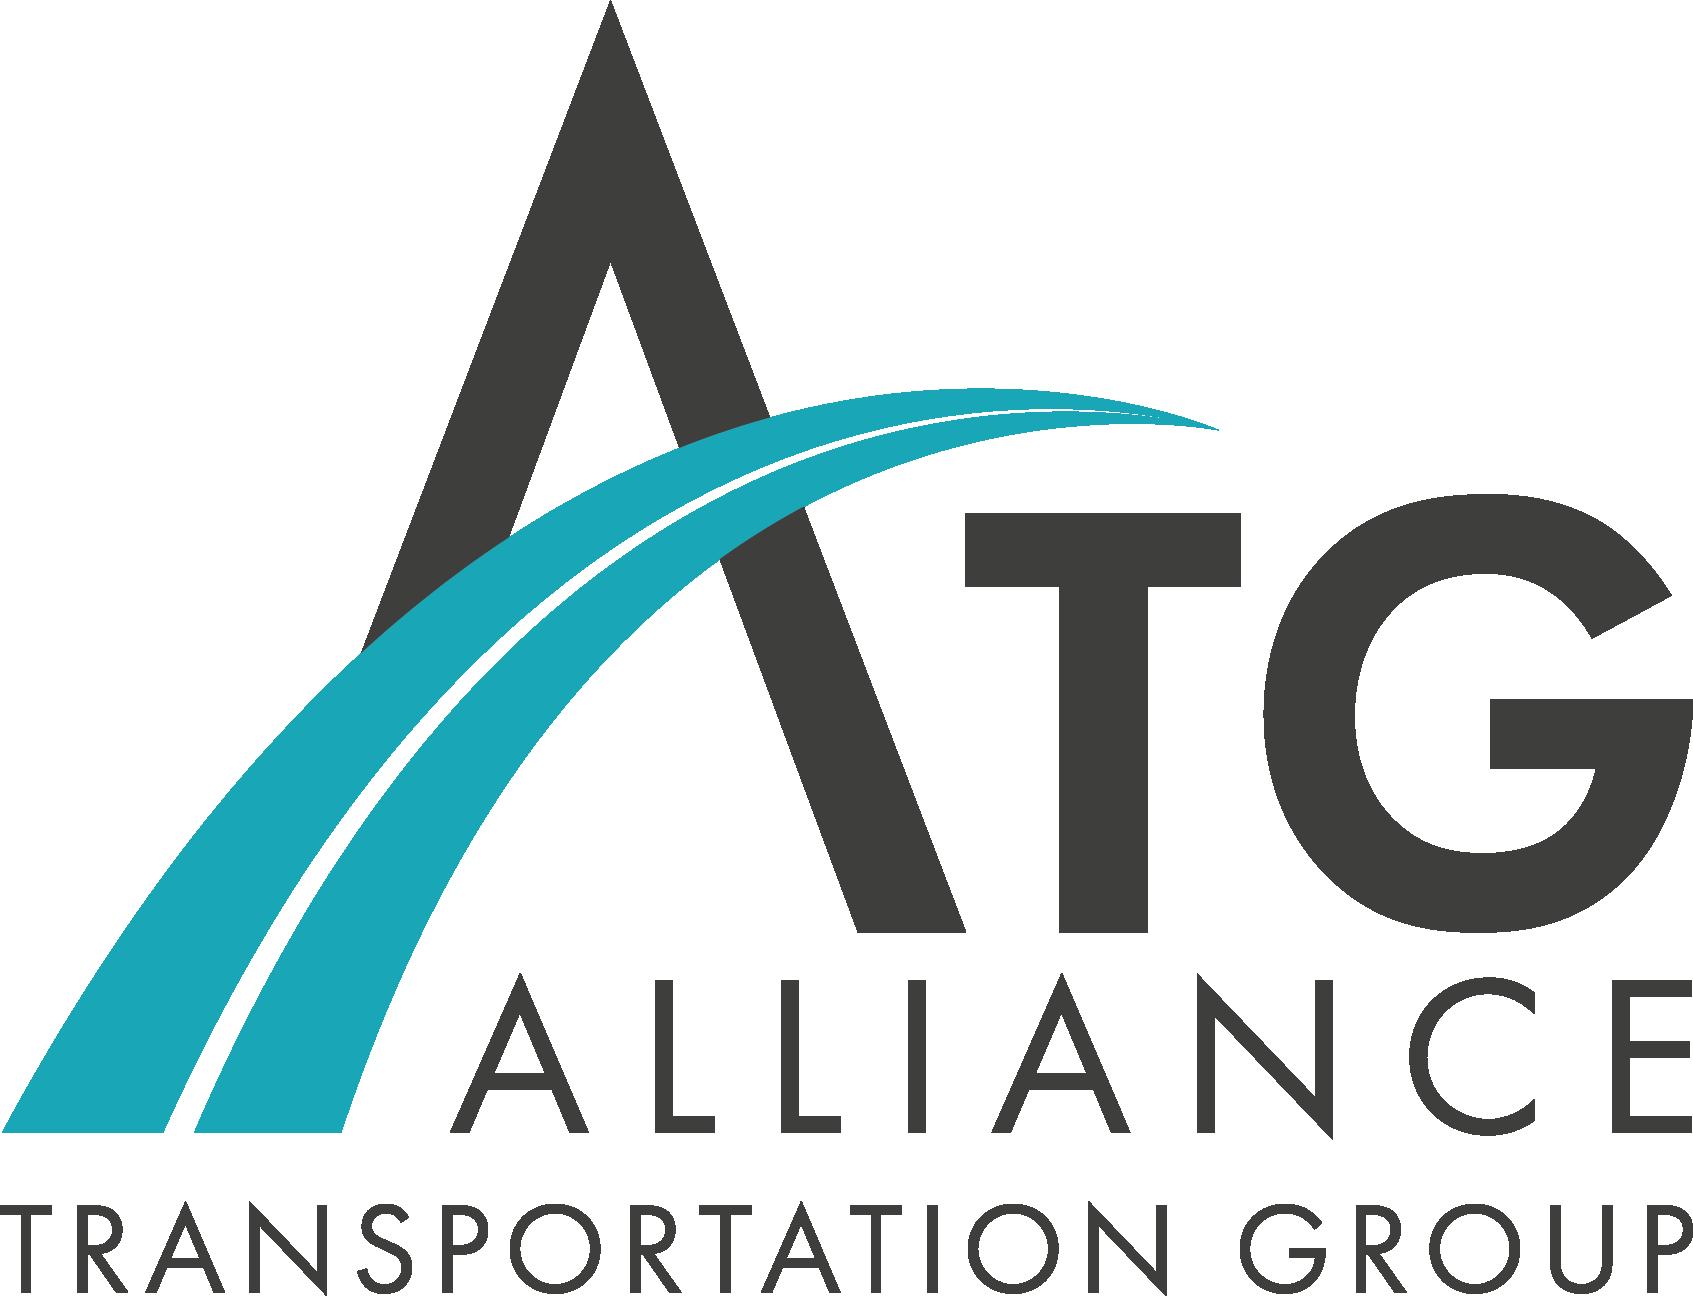 Alliance Transportation Group